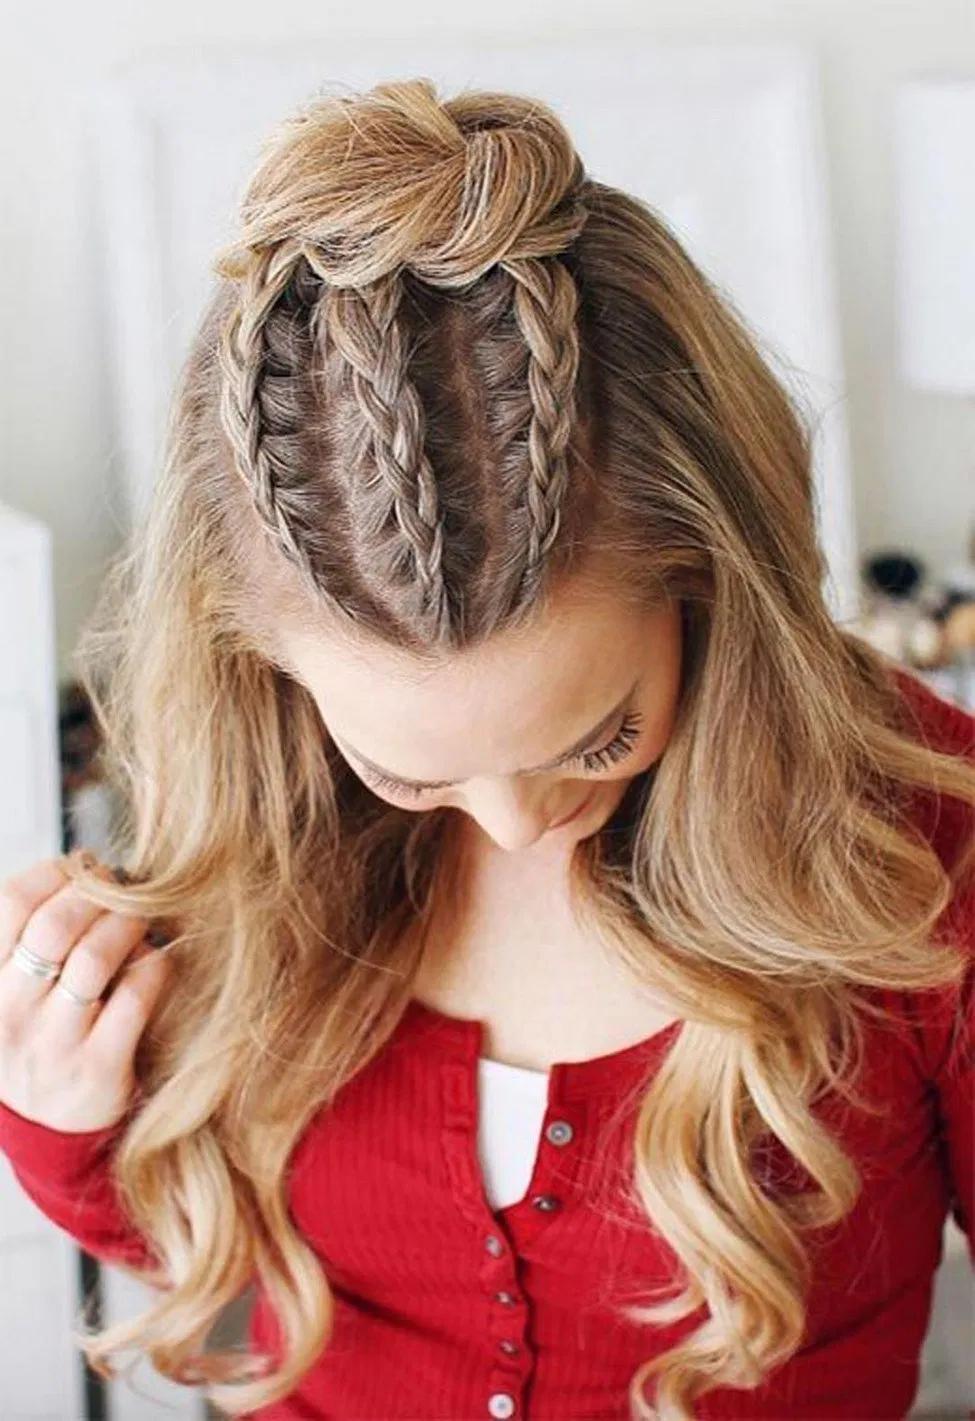 20 Braids Hairstyle & Quiffed Ponytail Hairstyle Ideas * remajacantik #BraidHairstyleDesignIdeas ...